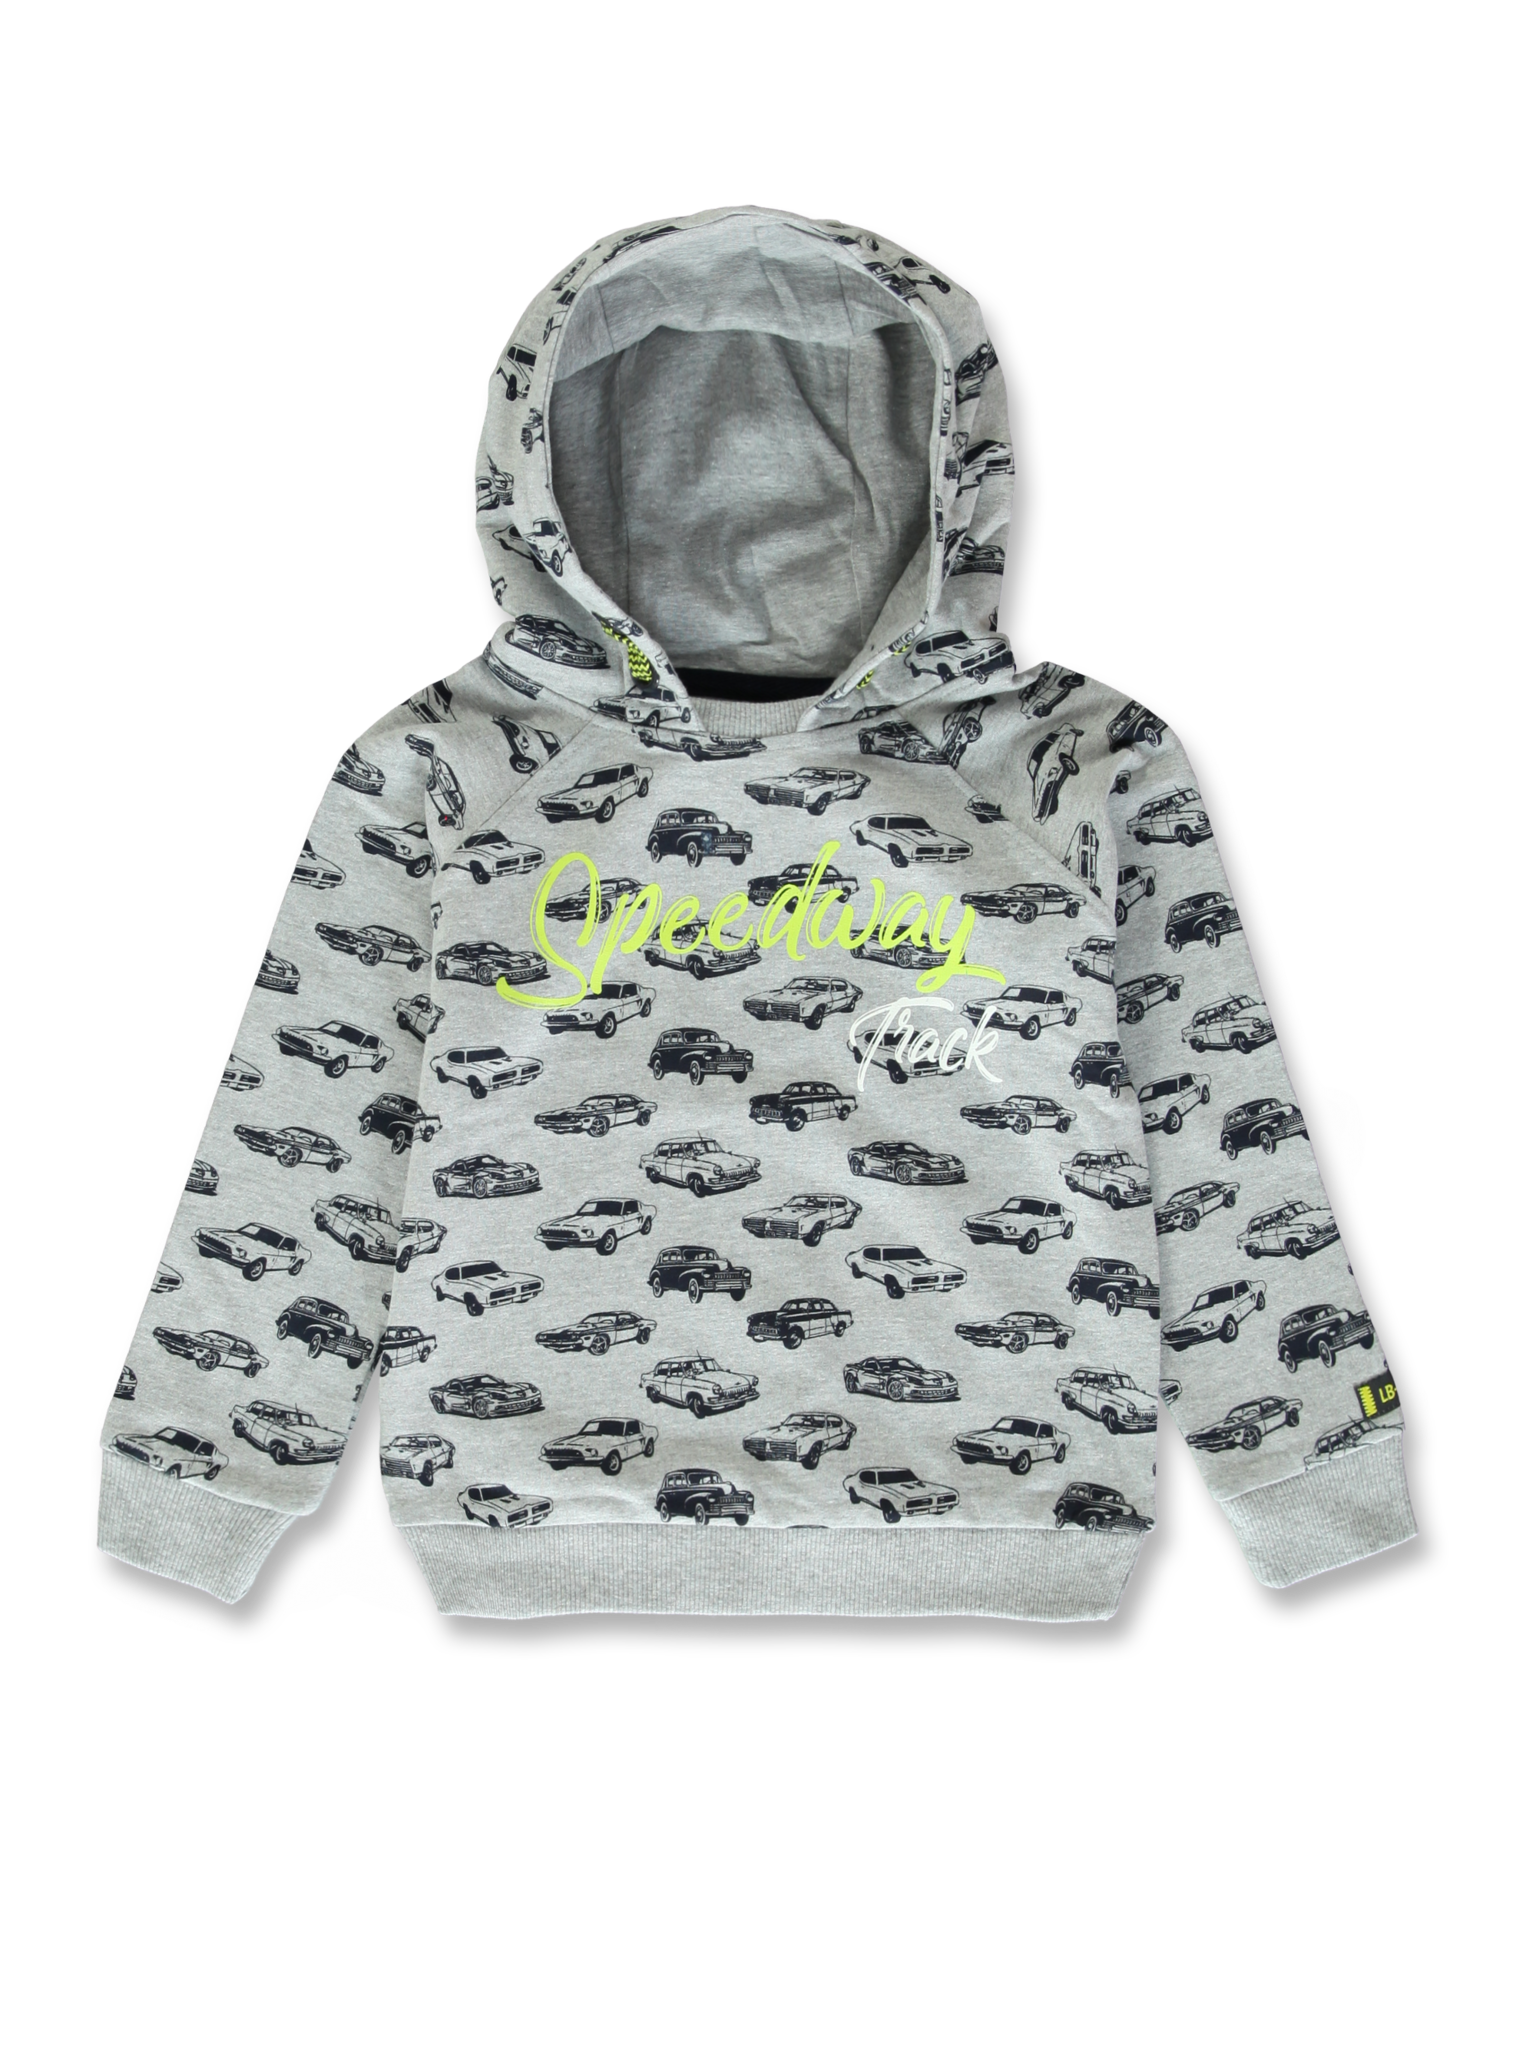 All Brands | Summerproducts Small Boys | Sweatshirt | 12 pcs/box